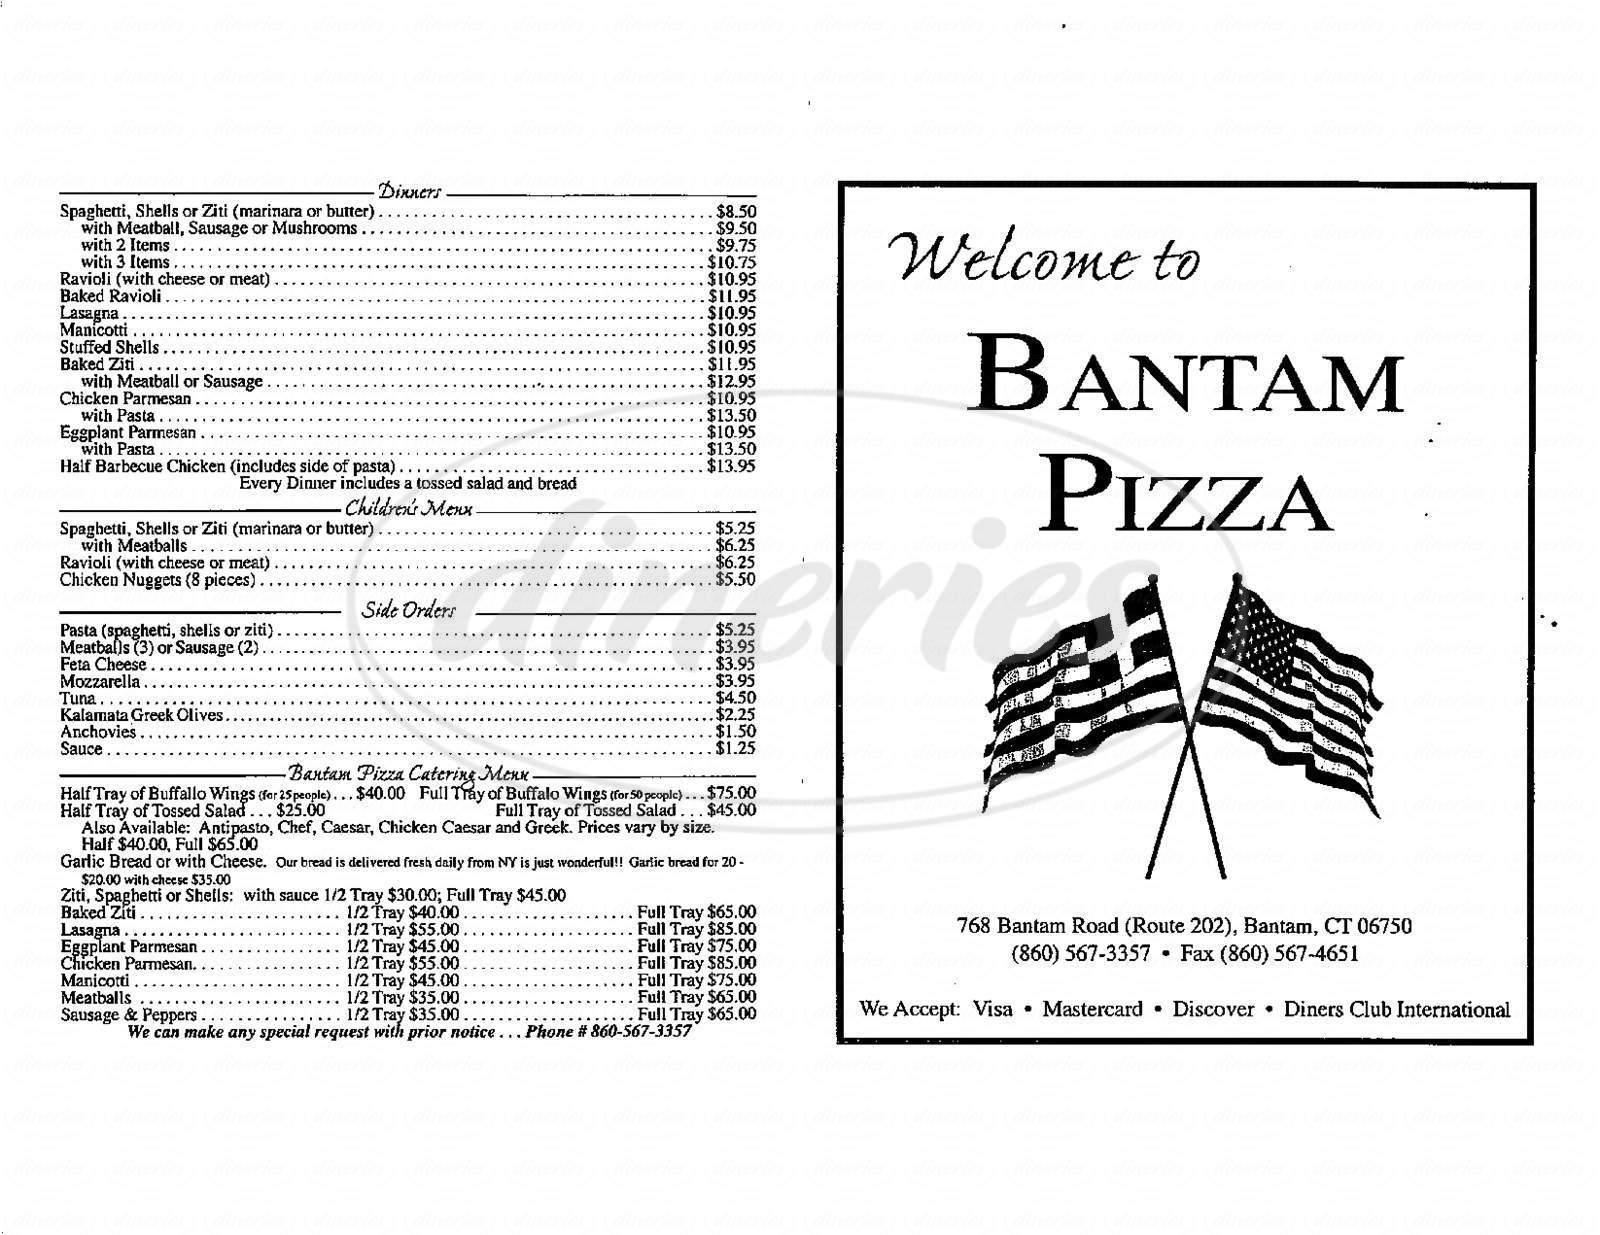 menu for Bantam Pizza & Restaurant